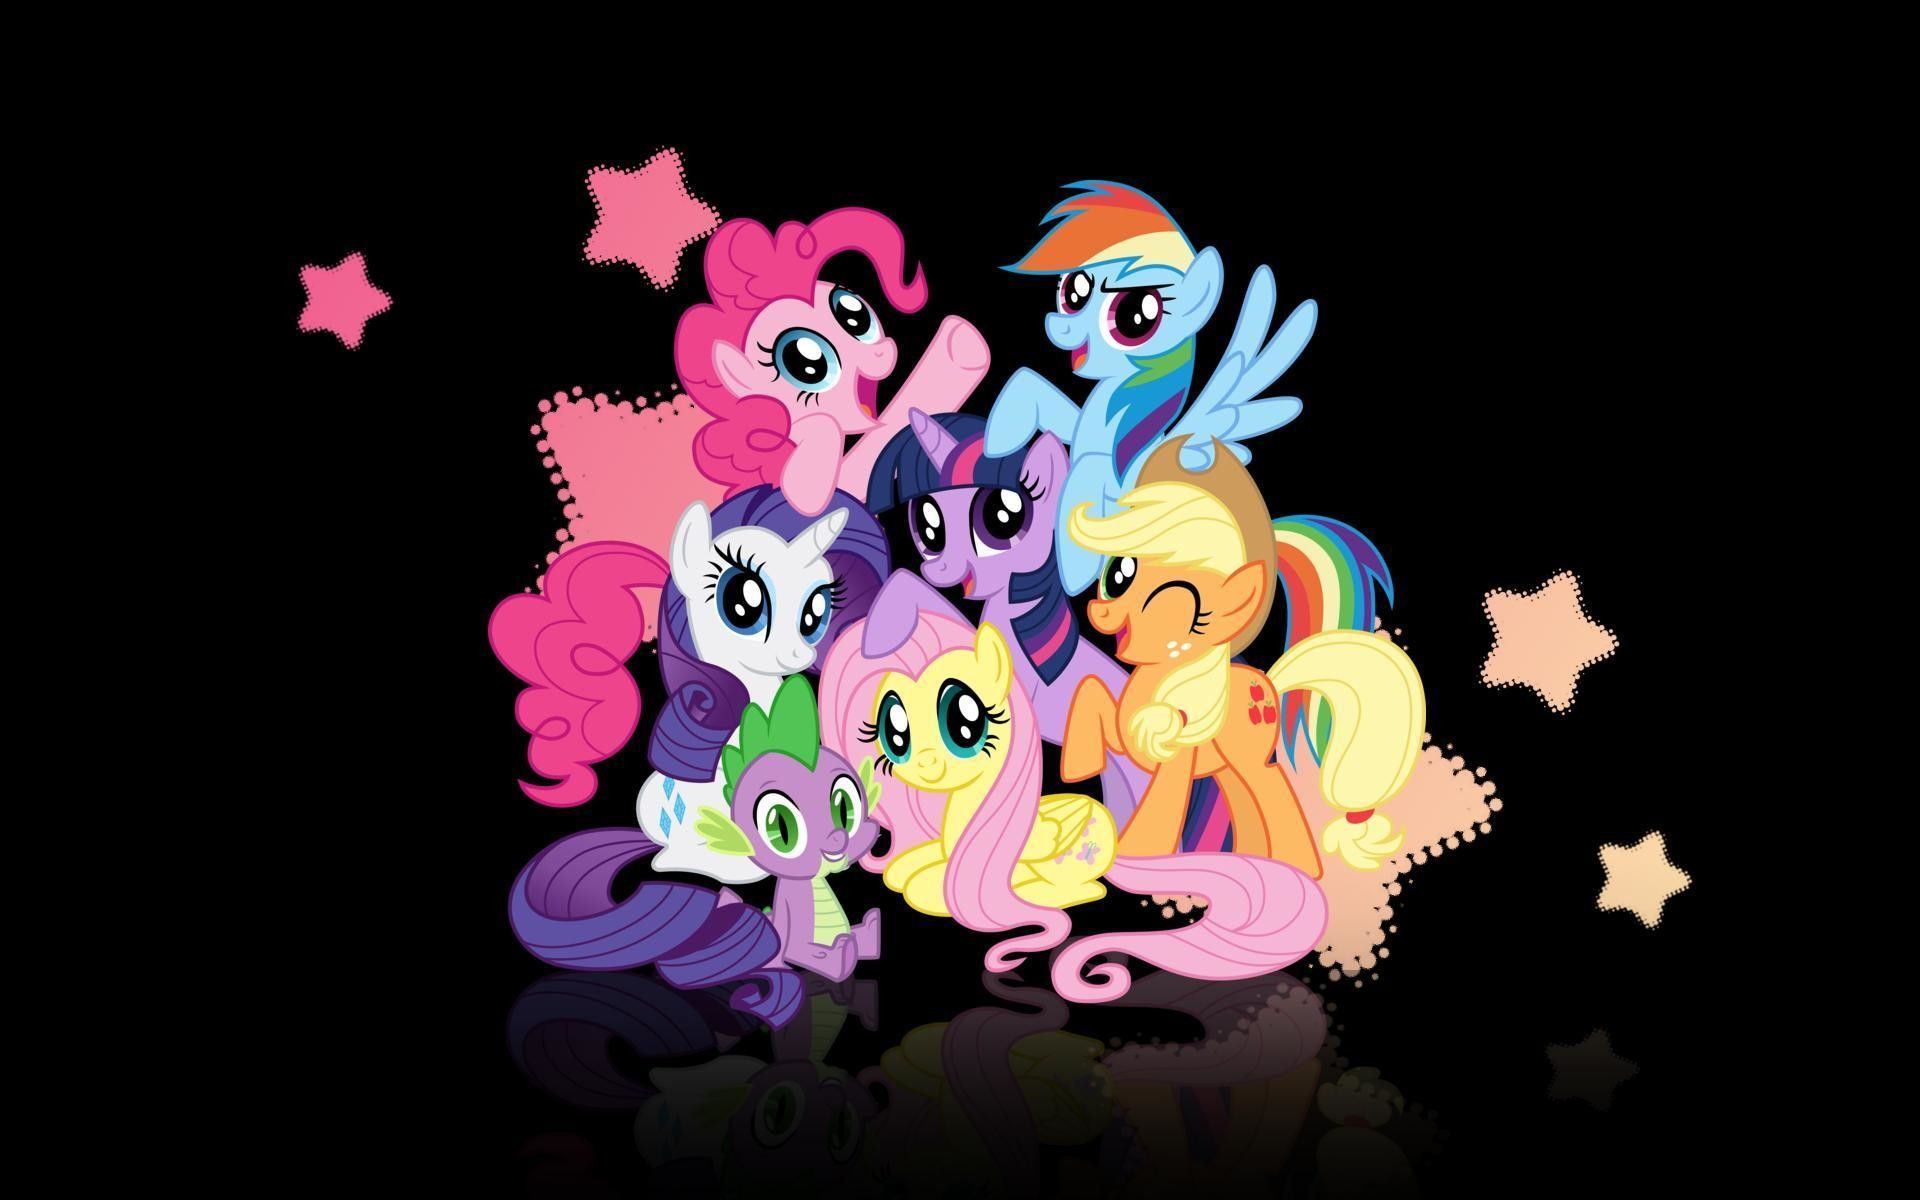 1920x1200 My Little Pony Cartoons HD Wallpaper